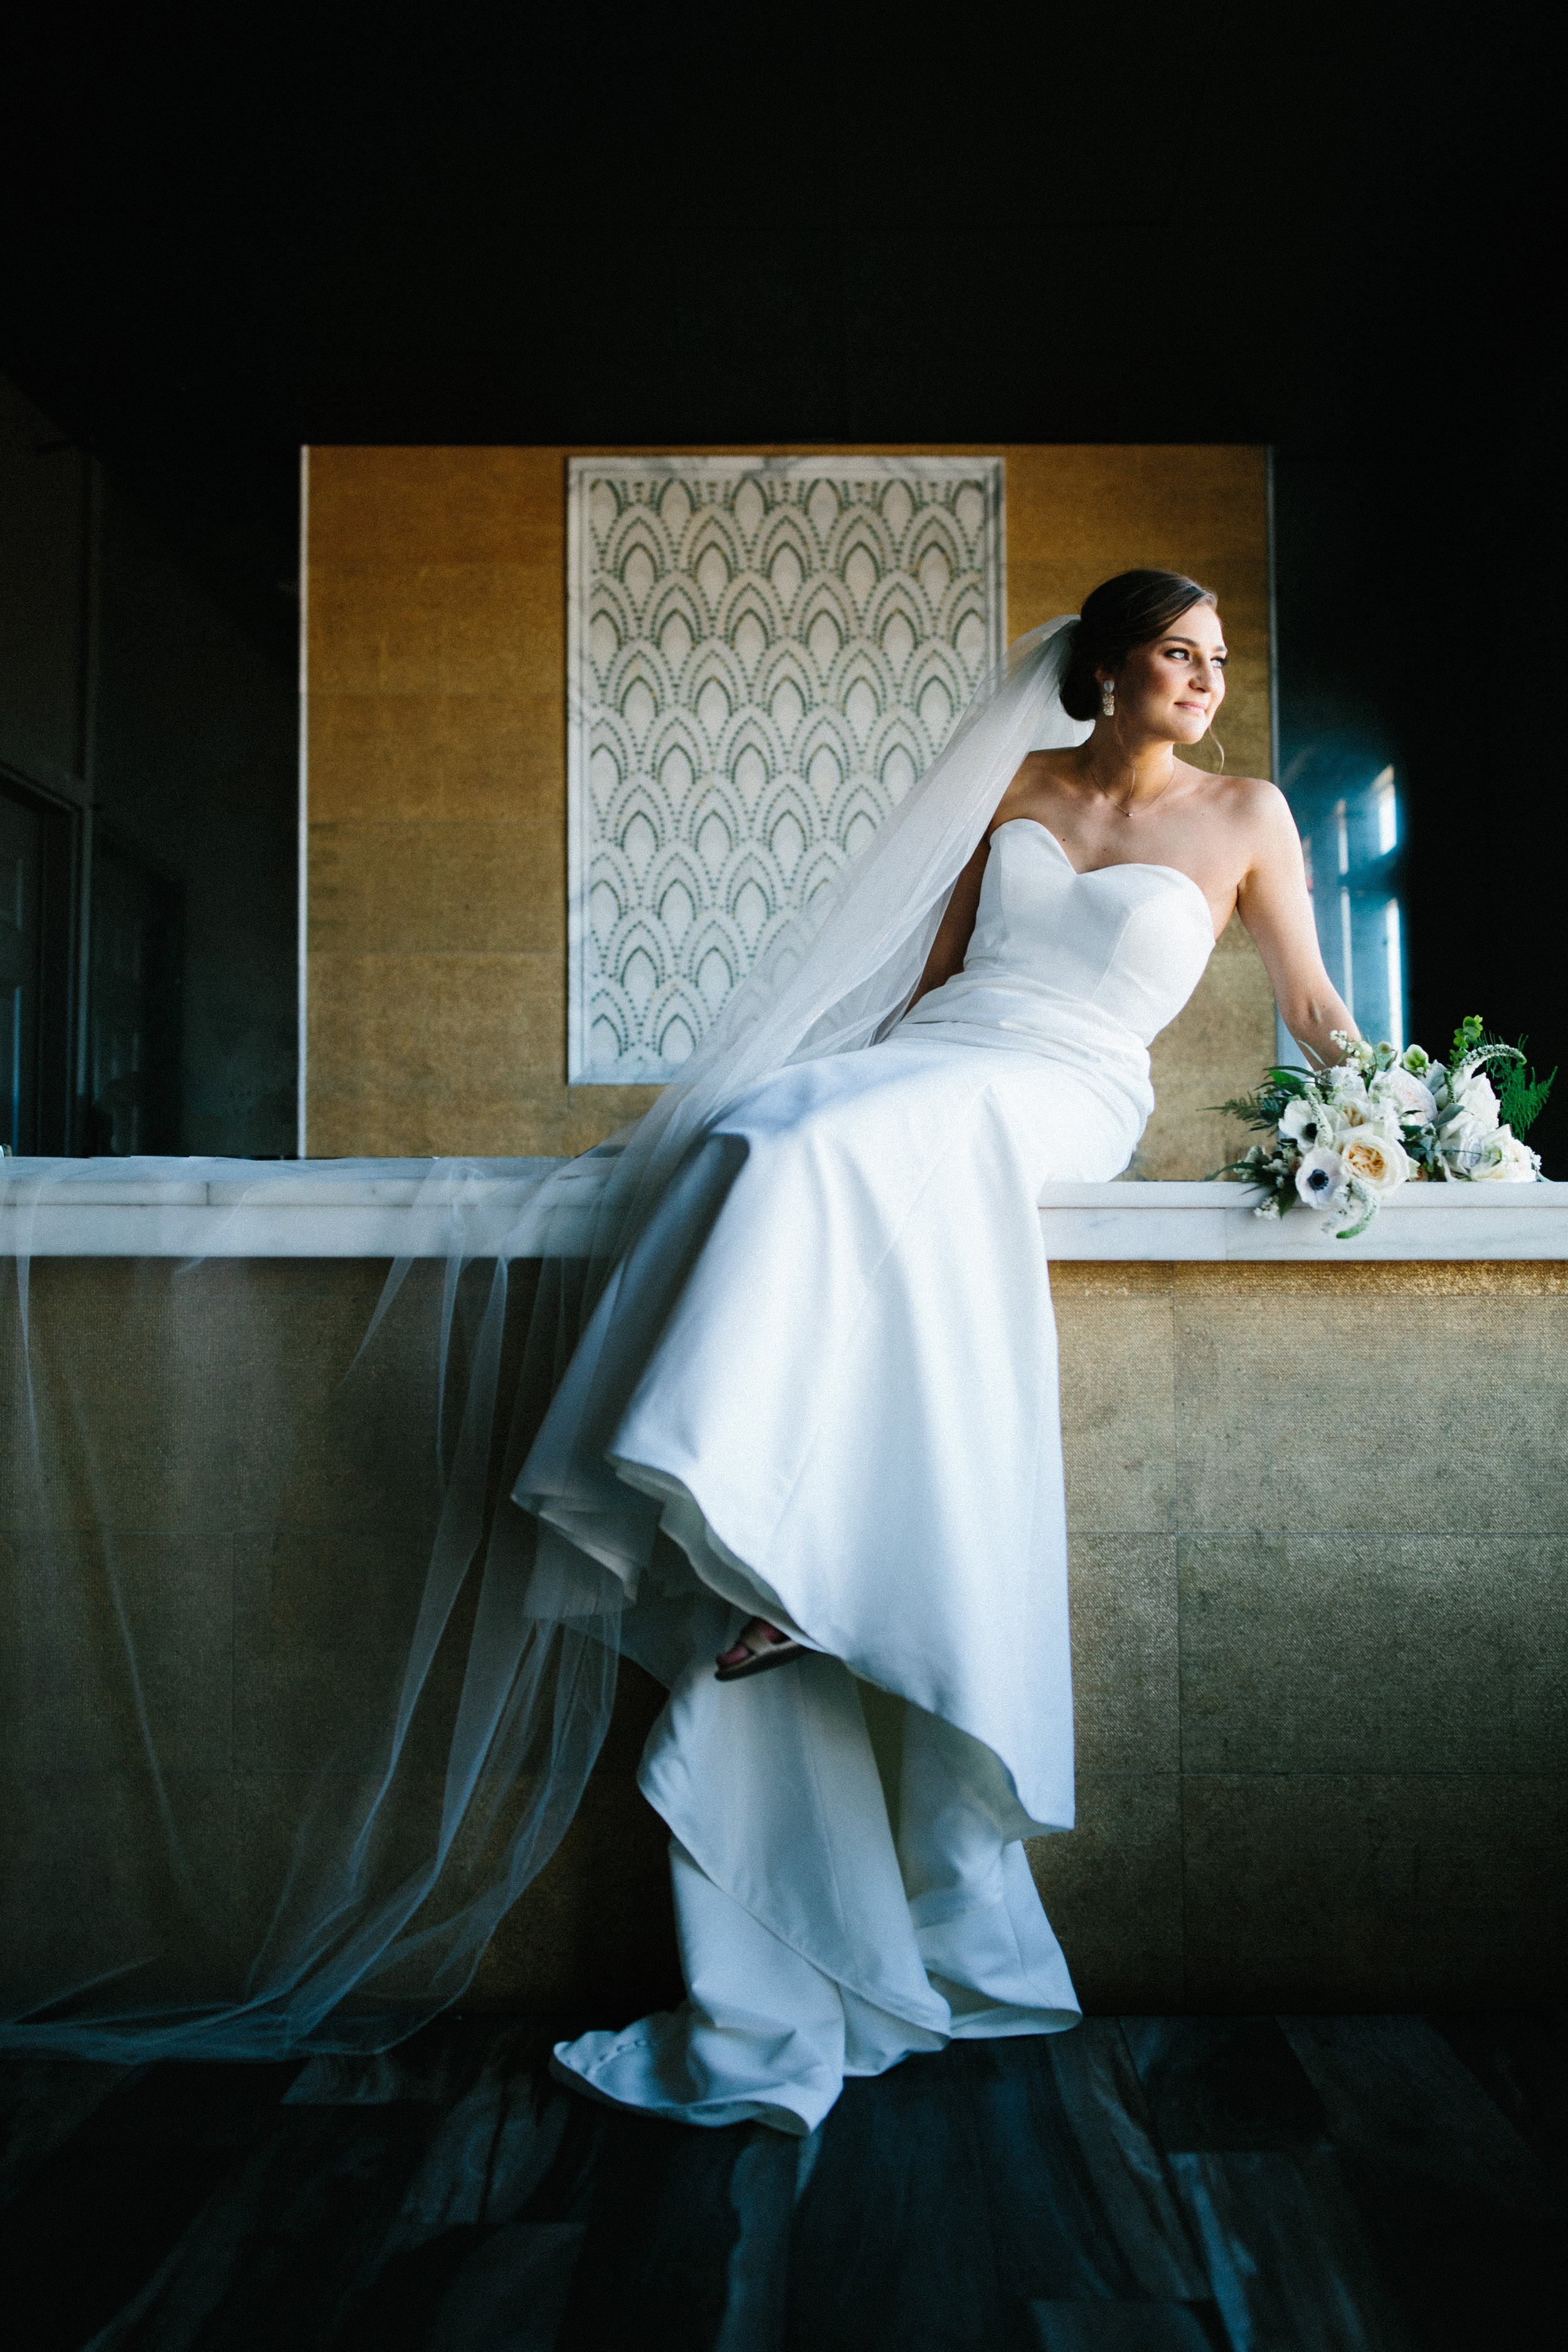 gatsby-bride.jpg